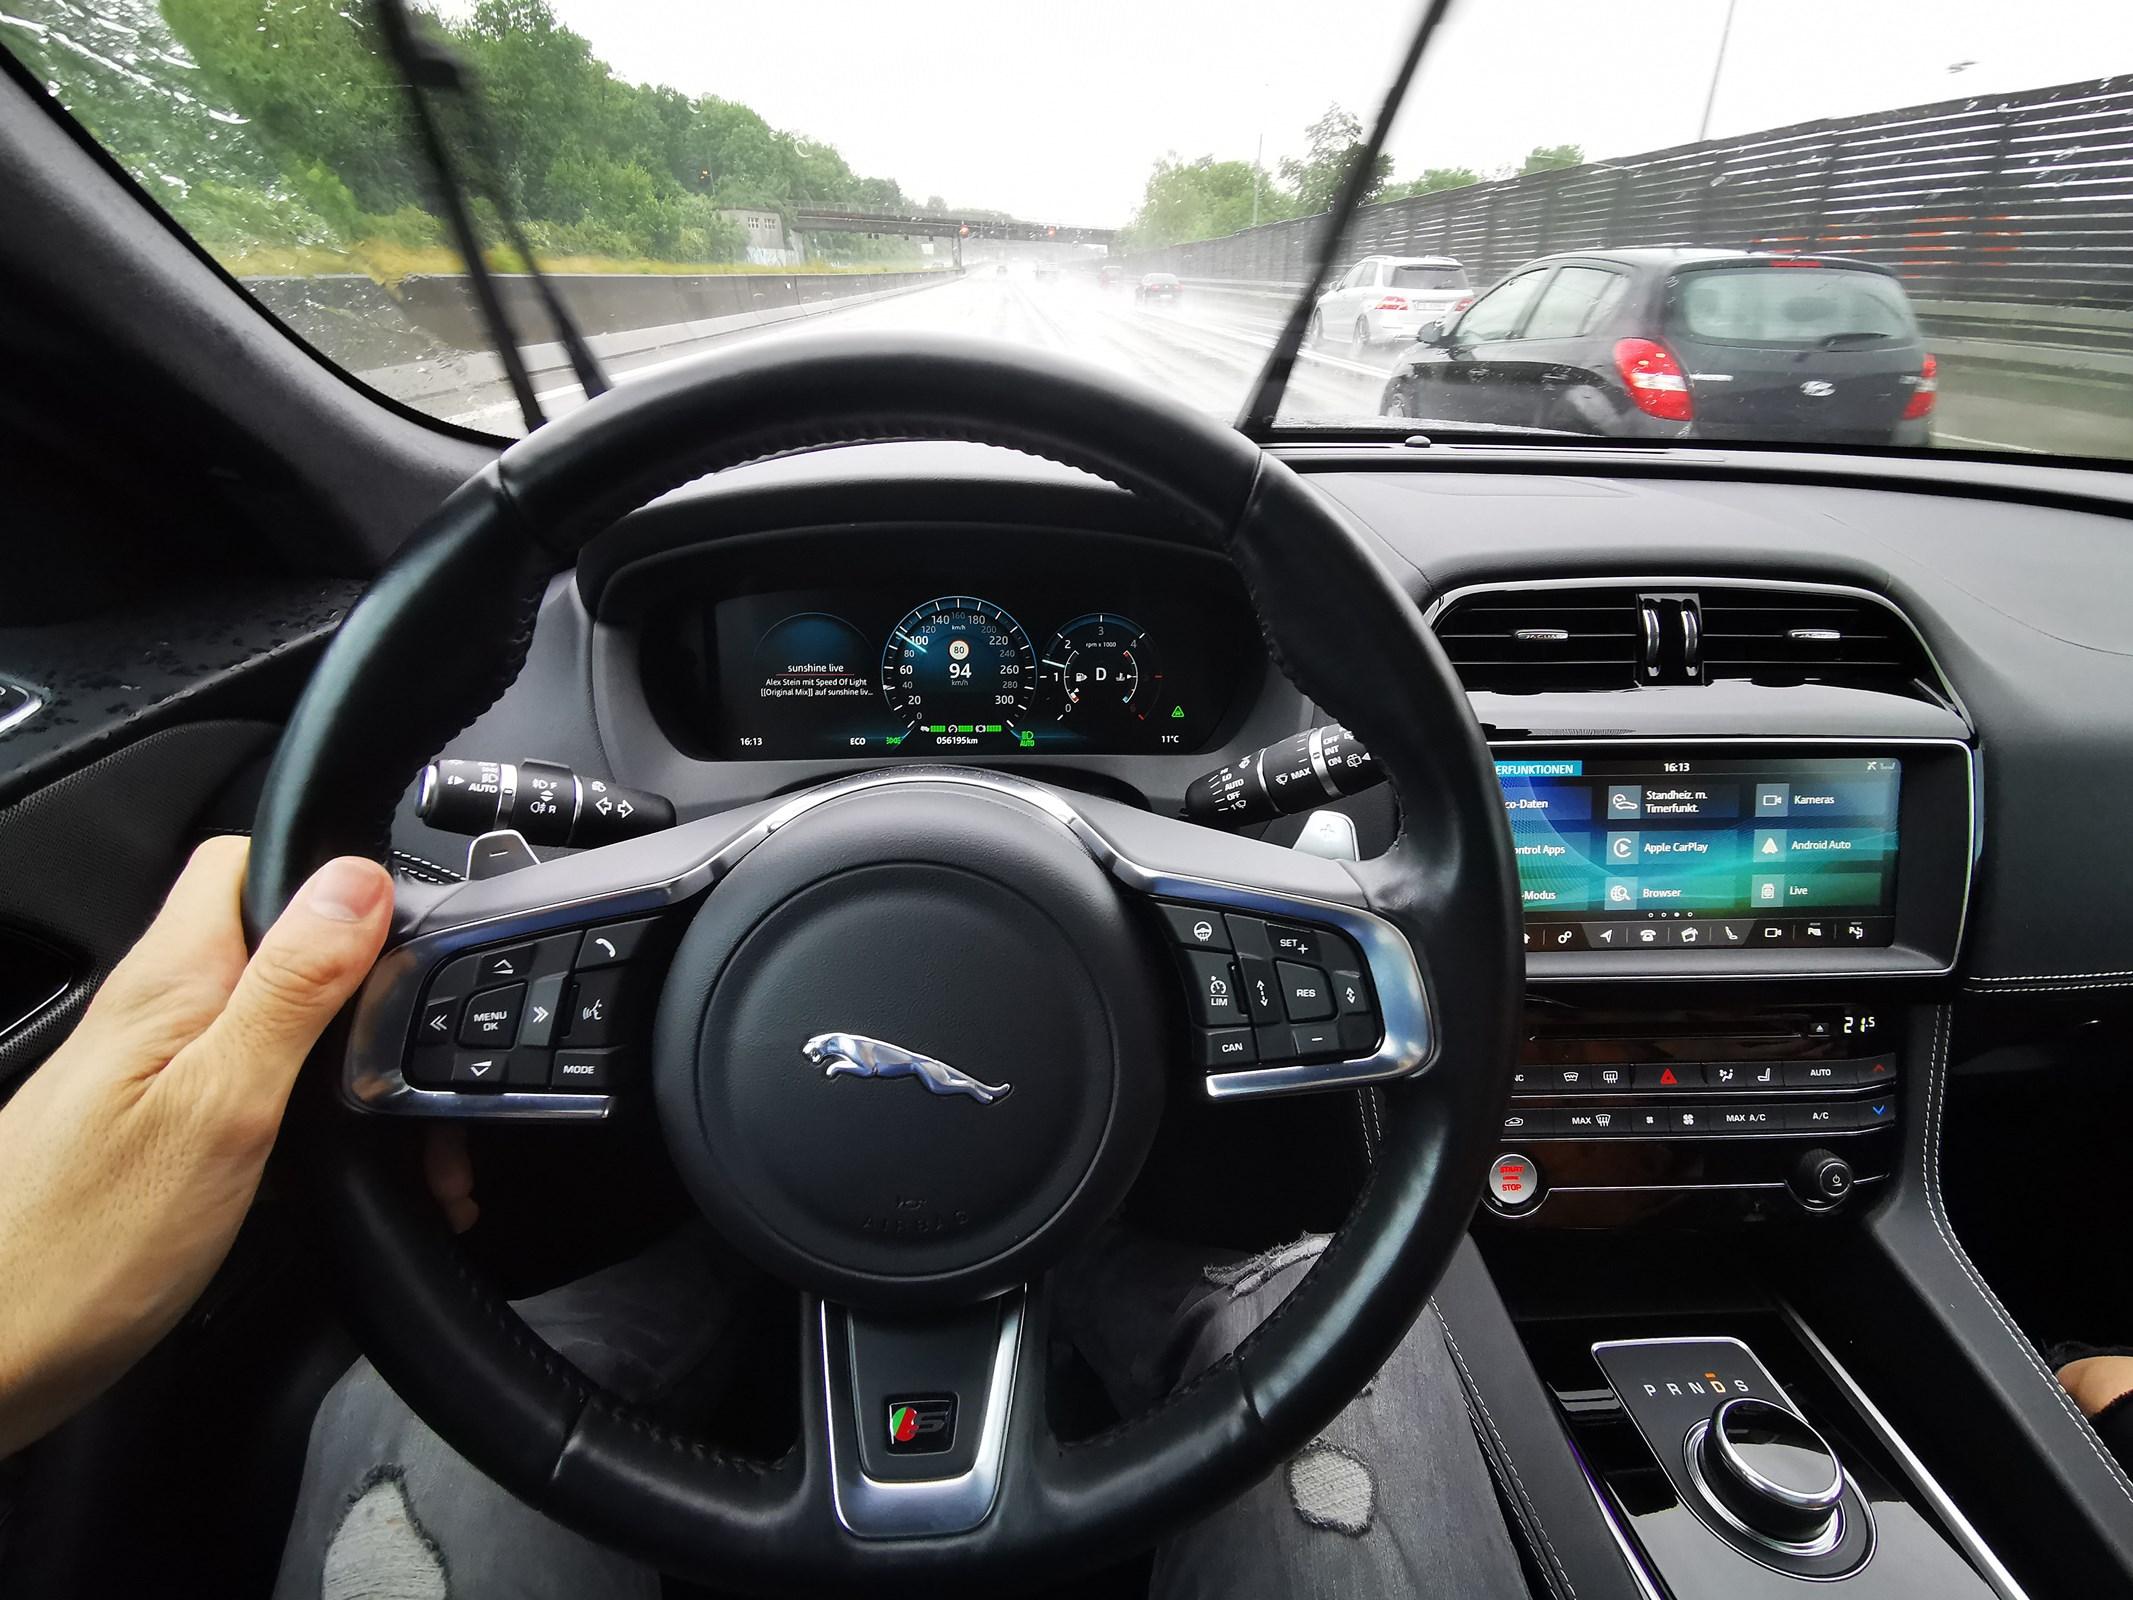 Jaguar F-Pace 3.0 V6 D S AWD